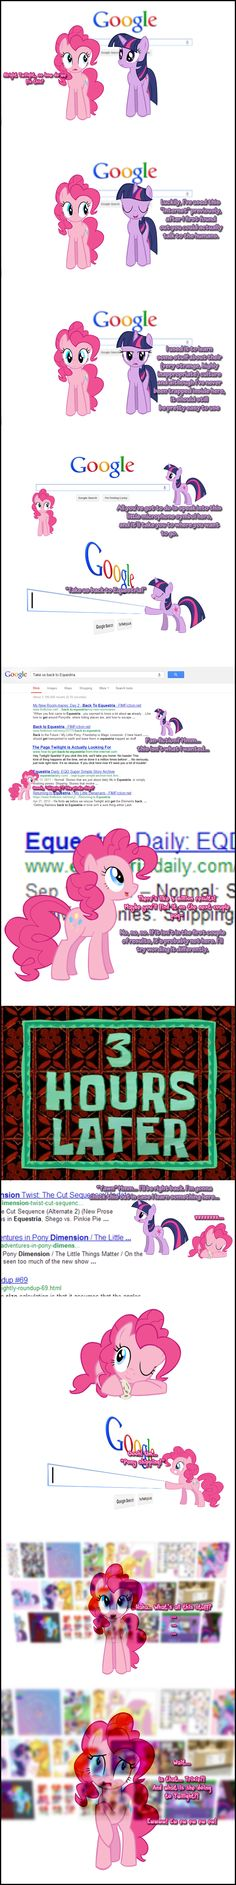 Friends don't let friends ship ponies.    Pinkie Pie says Google-search! by Undead-Niklos.deviantart.com on @deviantART